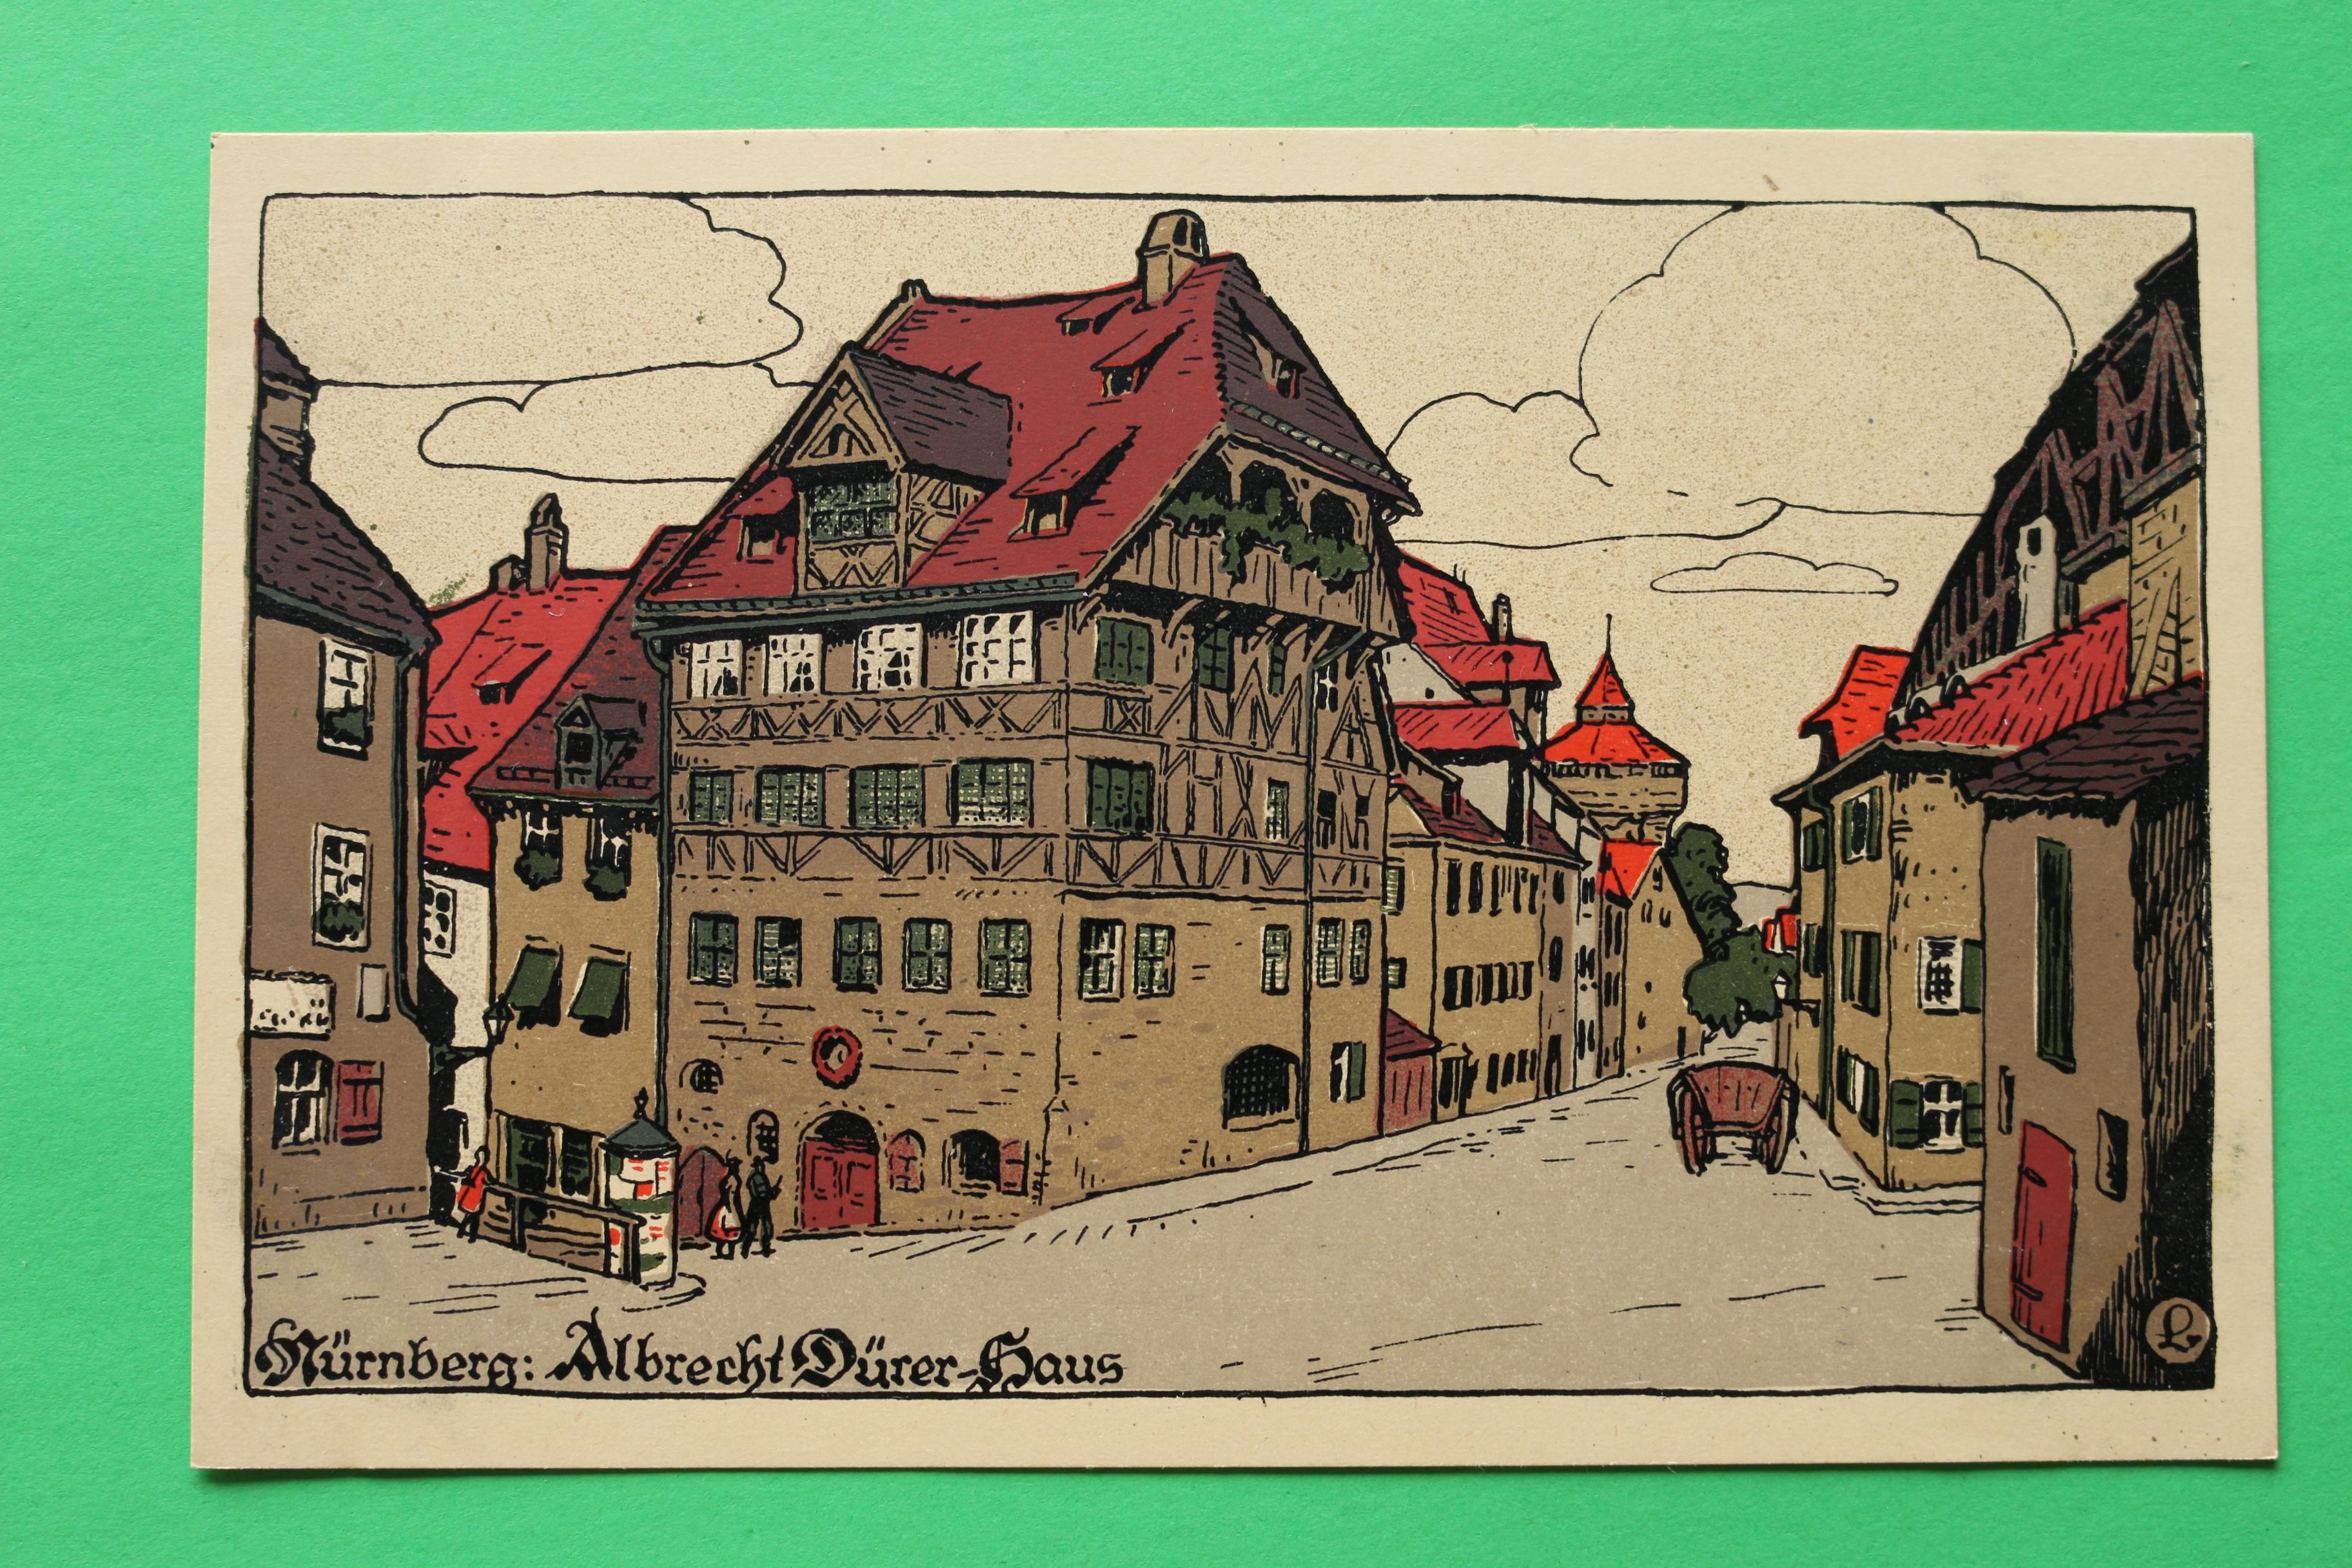 AK Nürnberg / 1910-1920 / Litho / Albrecht Dürer Haus / Künstler Stein  Zeichnung / Straßenansicht Litfaßsäule